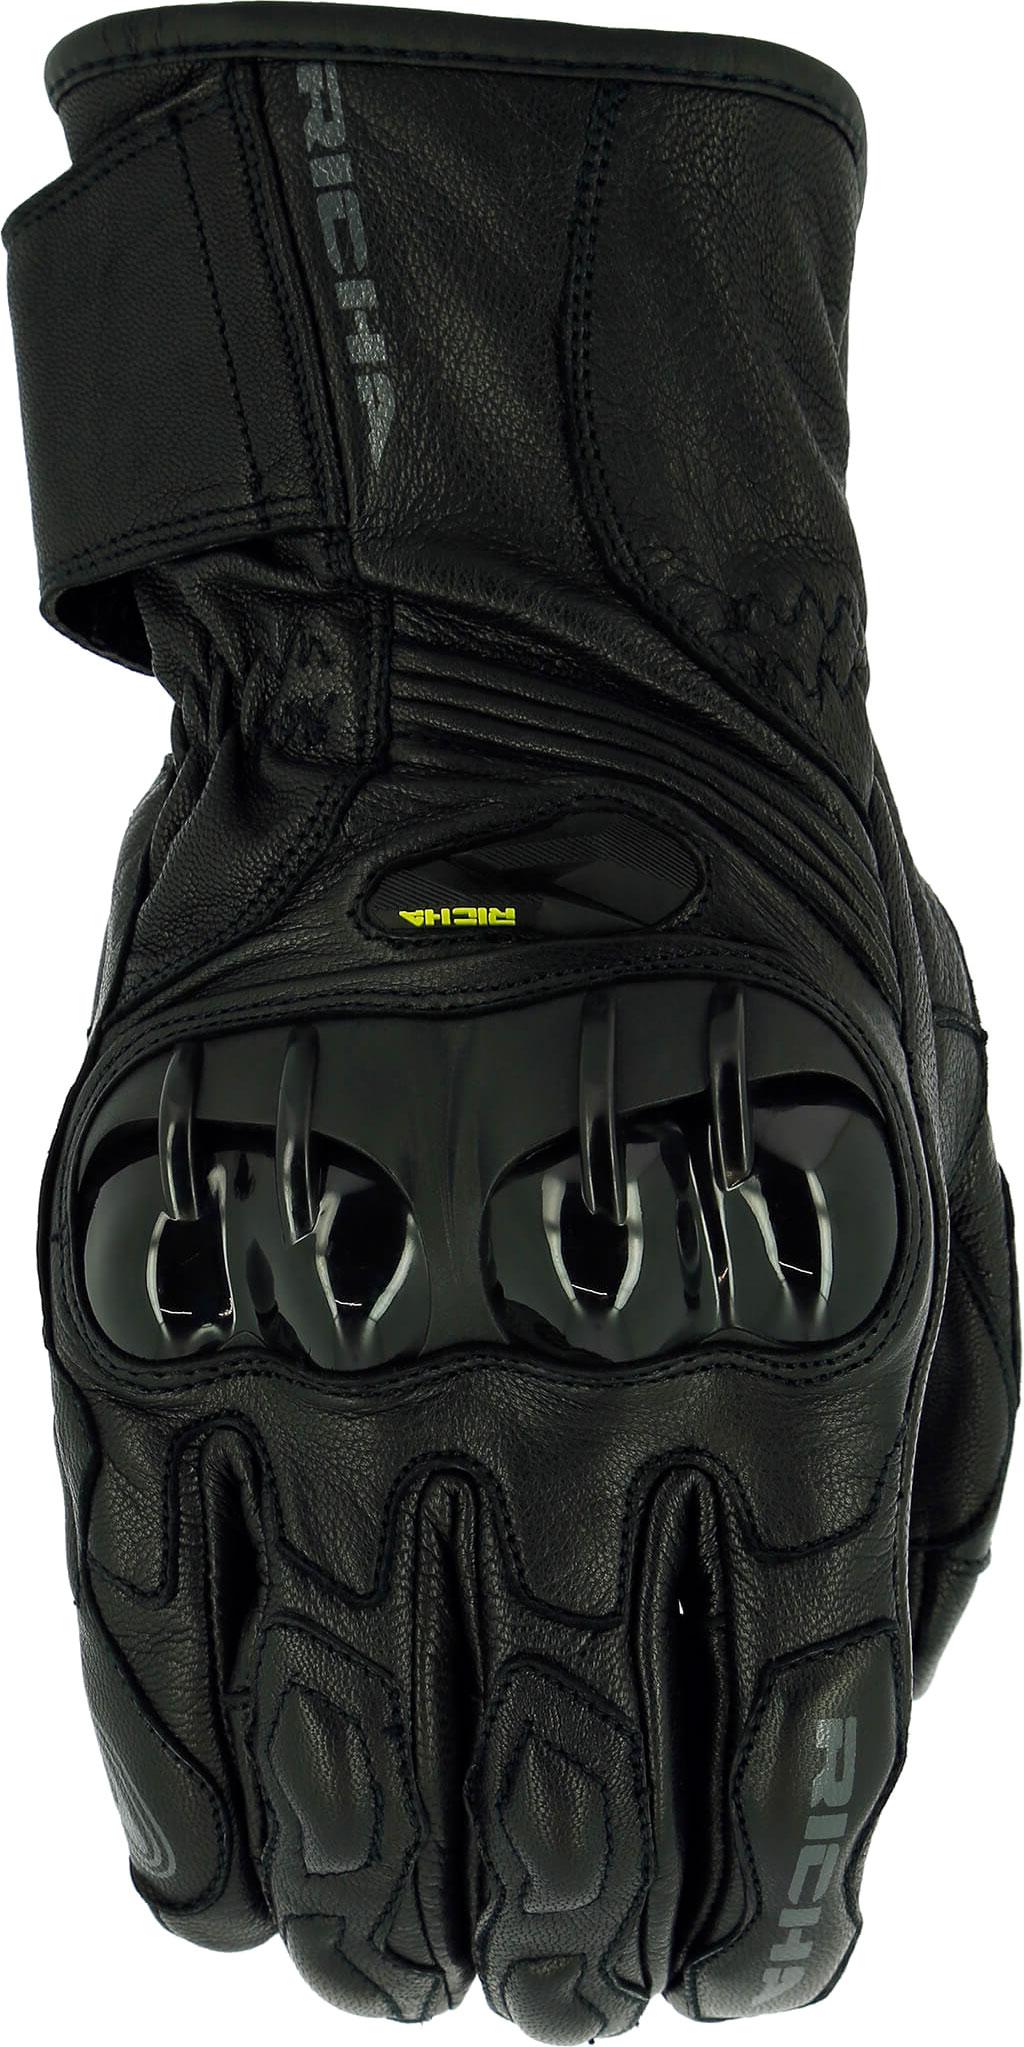 Richa Hawk, Handschuhe - Schwarz - M 5HAW-100-M